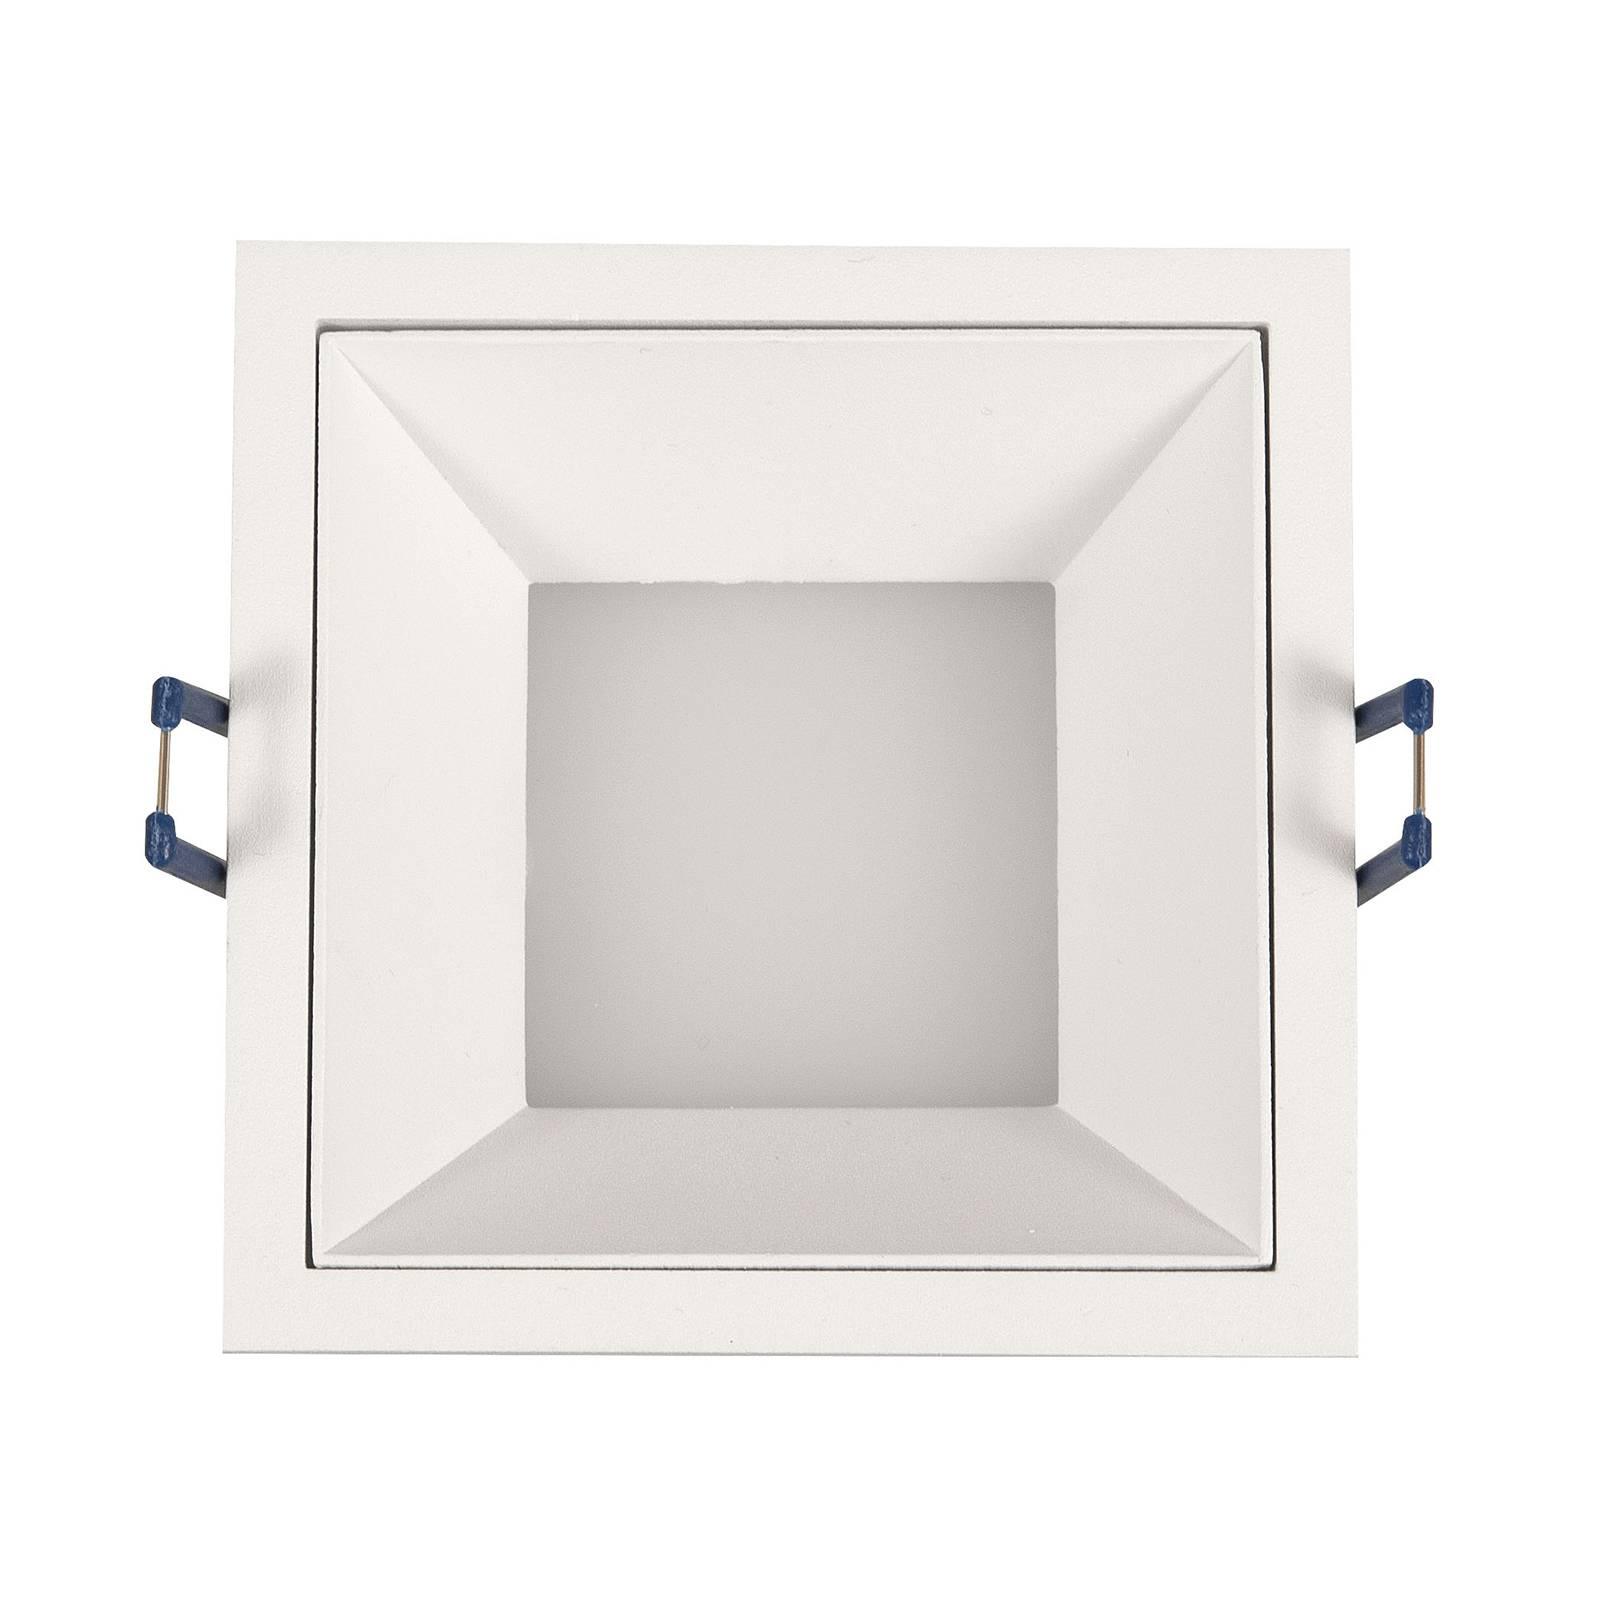 Inbouwspot Kris frame 3.000K symmetrisch wit